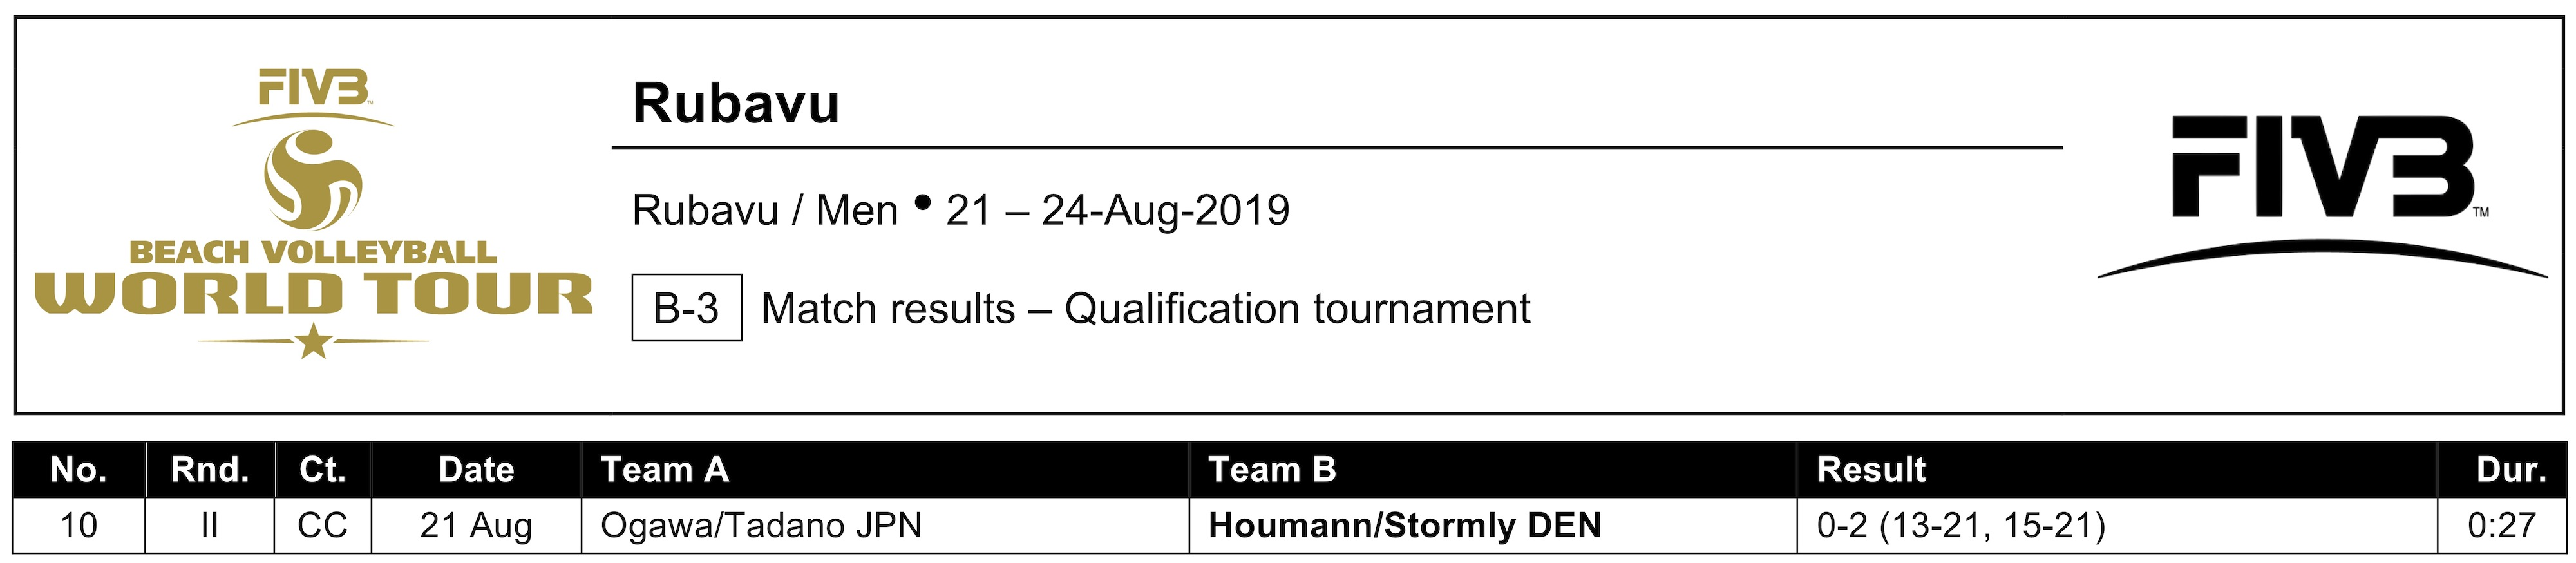 News - Hovmann and Stormly storm into Ruvabu main draw